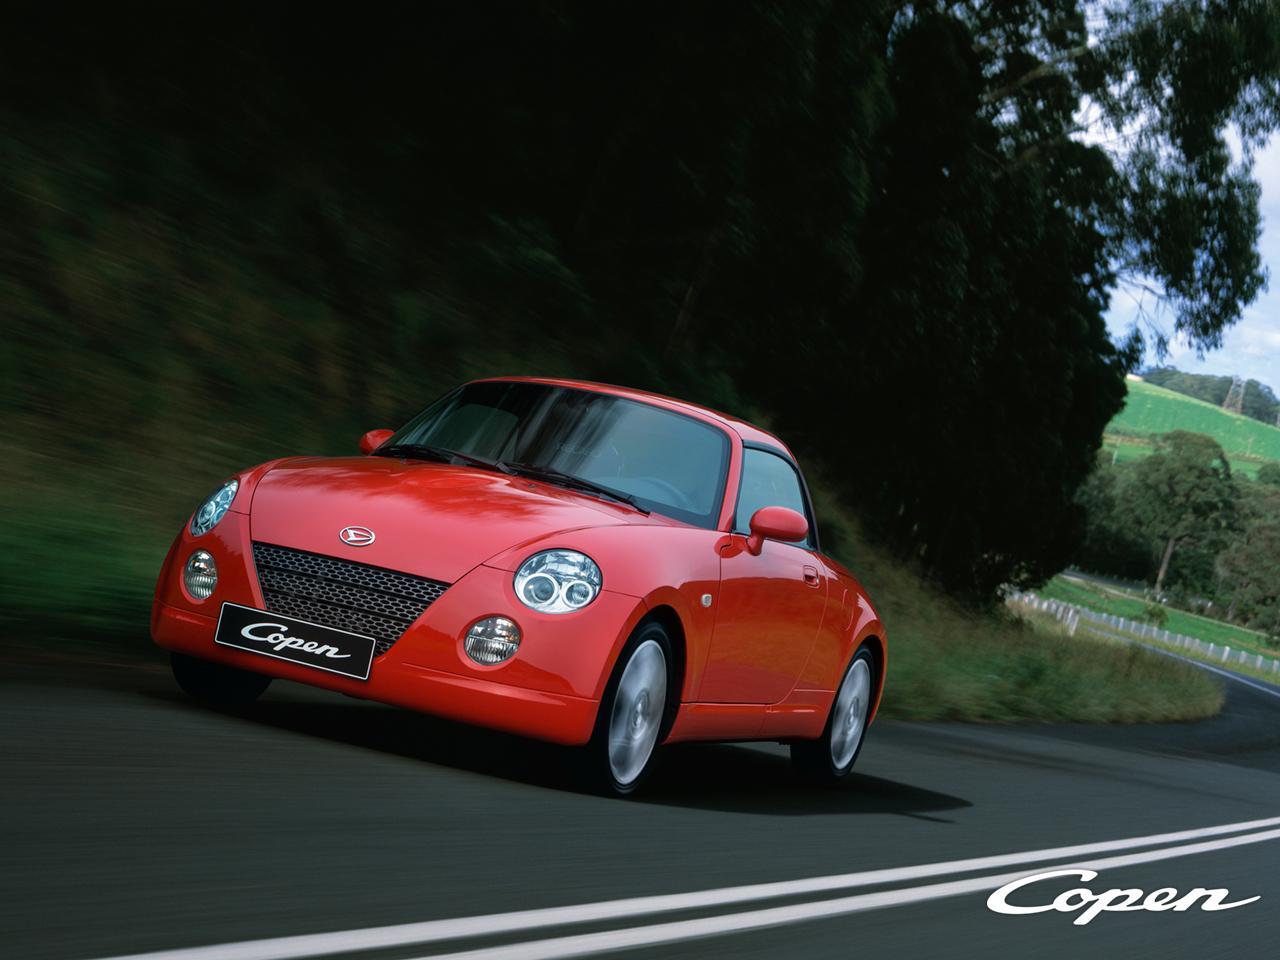 2009 Daihatsu Copen News and Information | conceptcarz.com